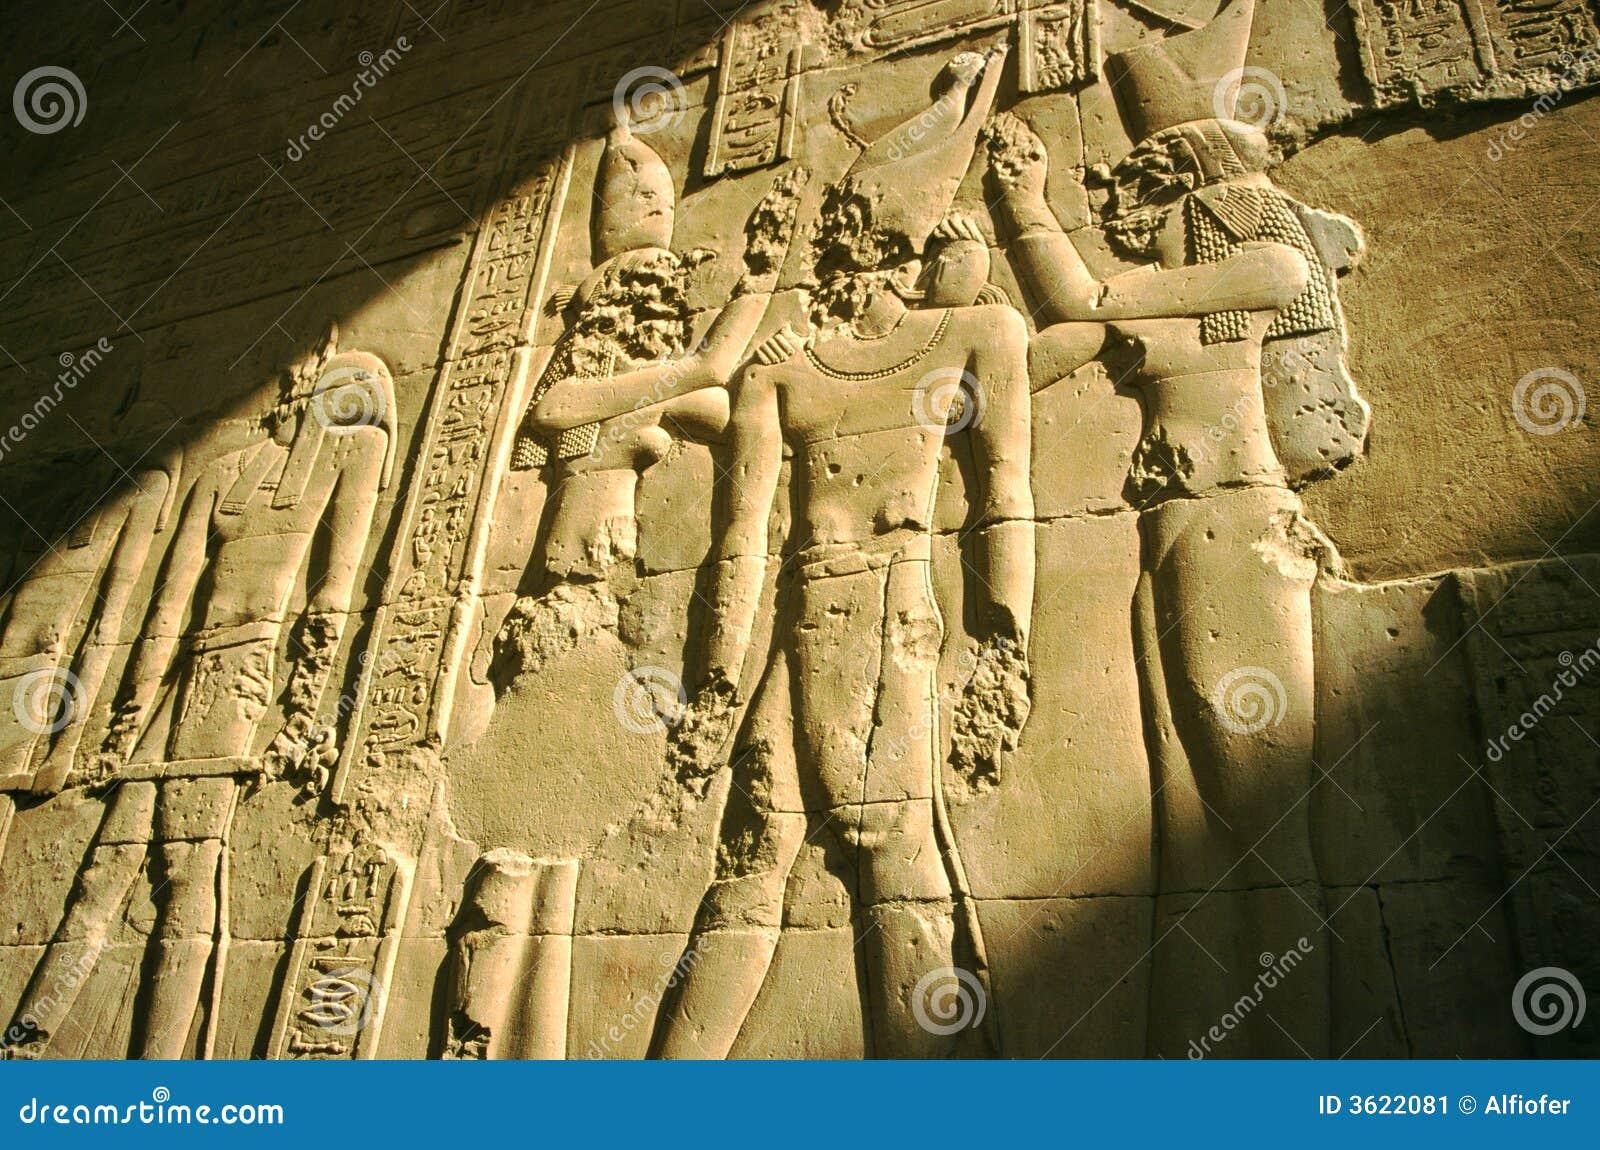 luxor temple bas relief egypt stock image image 3622081. Black Bedroom Furniture Sets. Home Design Ideas